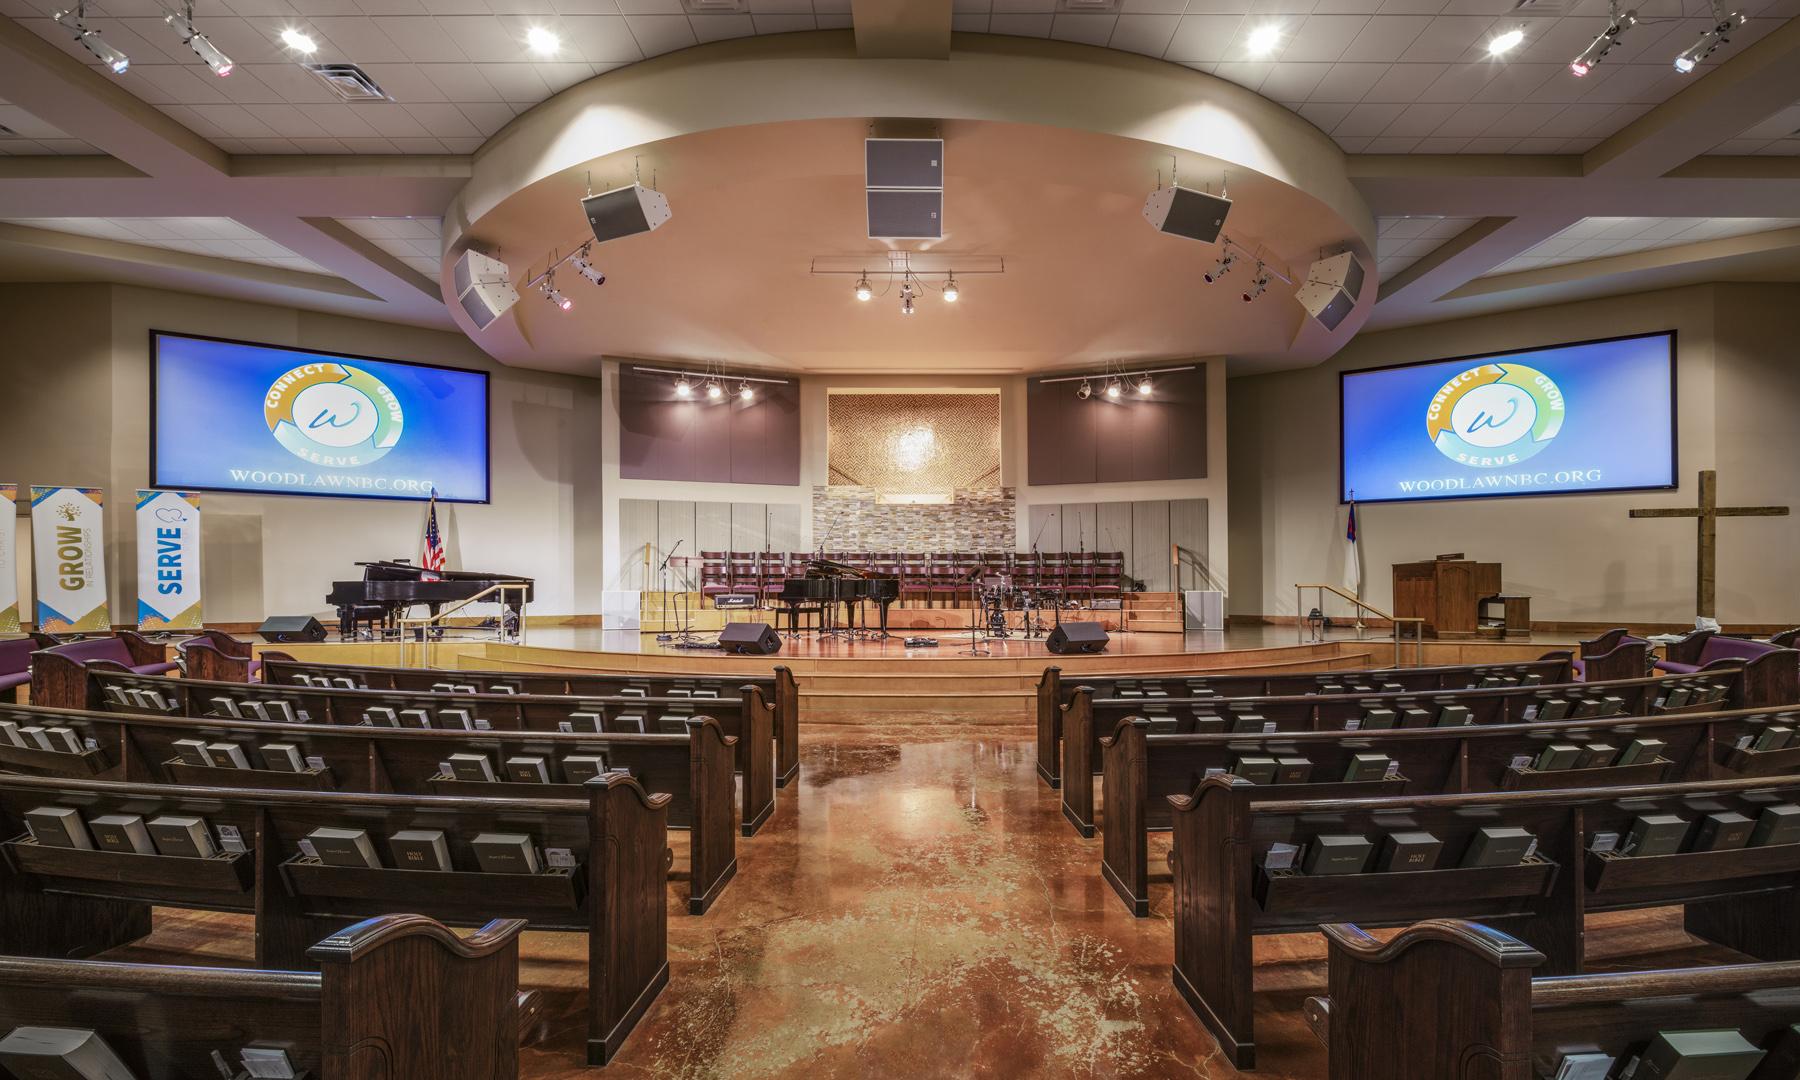 Woodlawn Baptist Church Sanctuary Interior, Austin, TX, Heimsath Architects Church Design Specialists